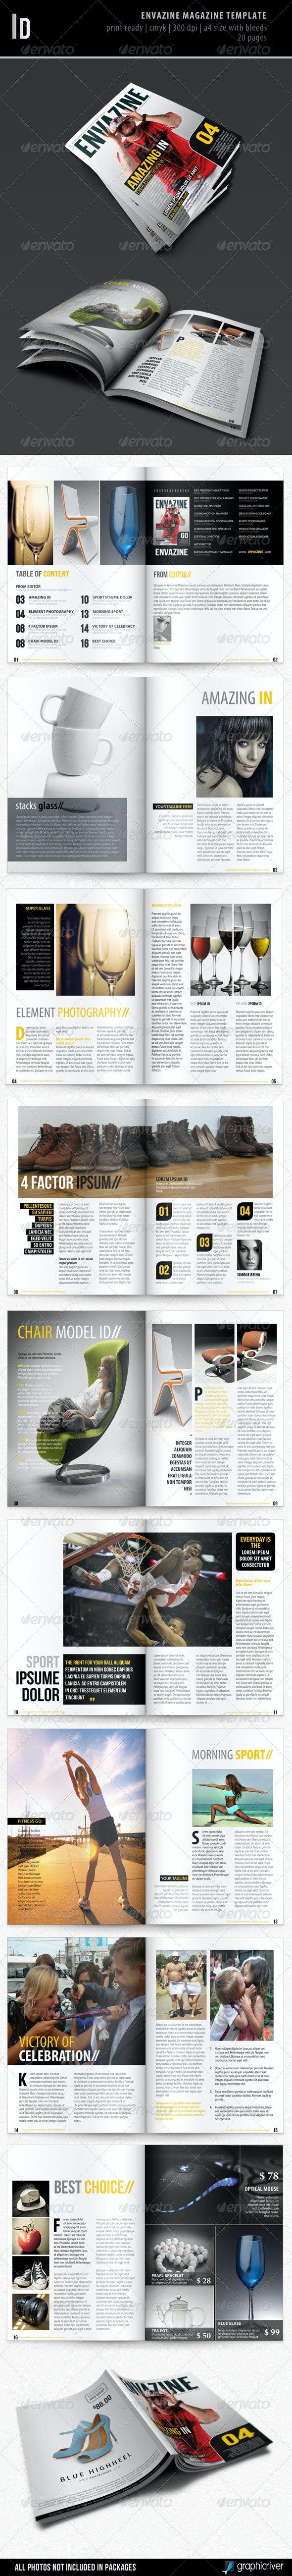 Envazine Magazine Template - Magazines Print Templates